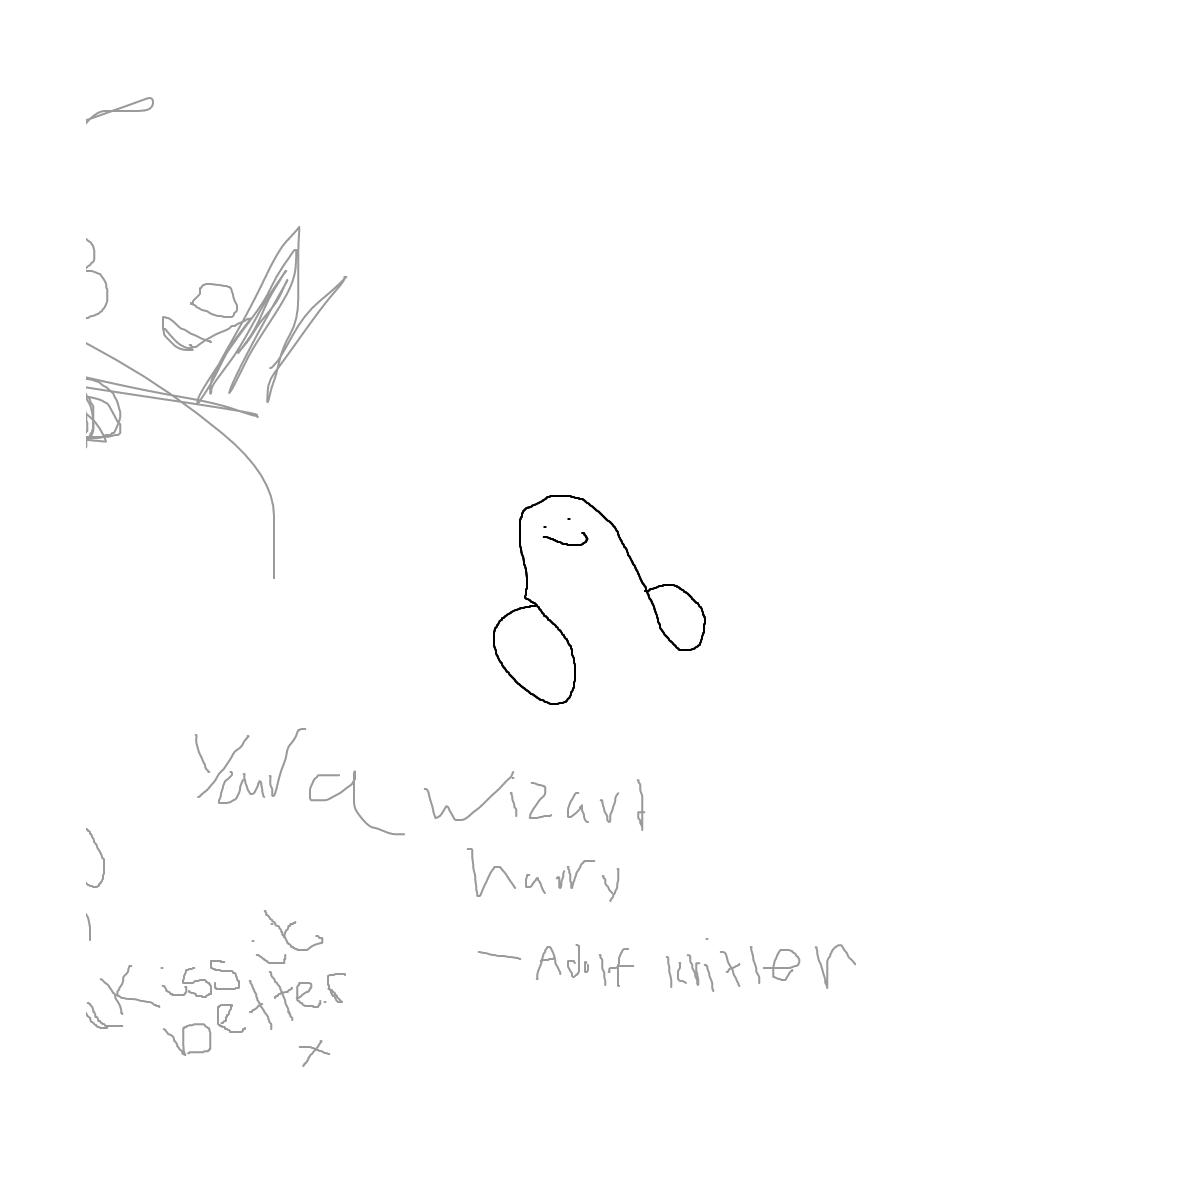 BAAAM drawing#365 lat:51.4957046508789060lng: -2.5085949897766113